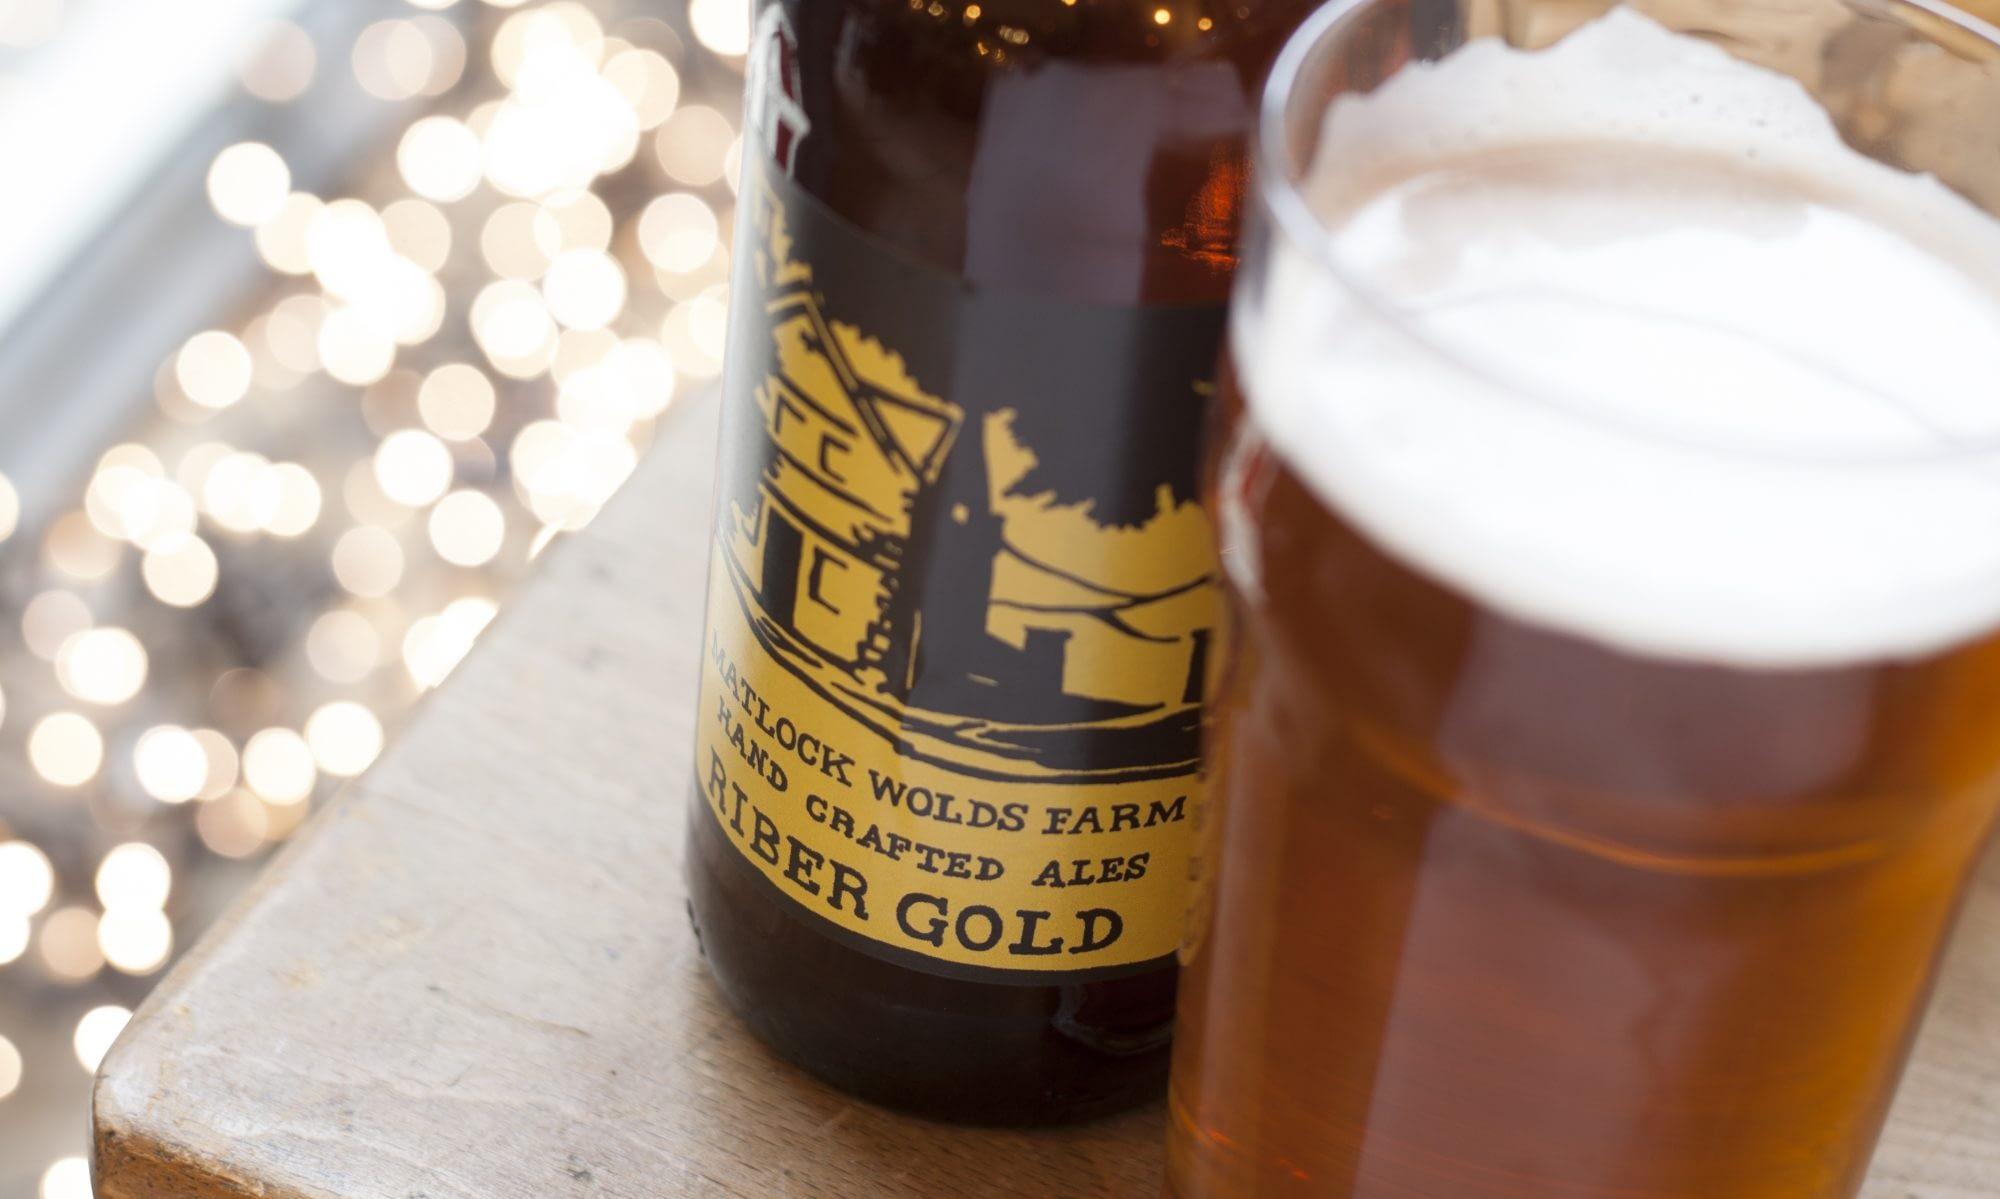 Matlock Wolds Farm Brewery